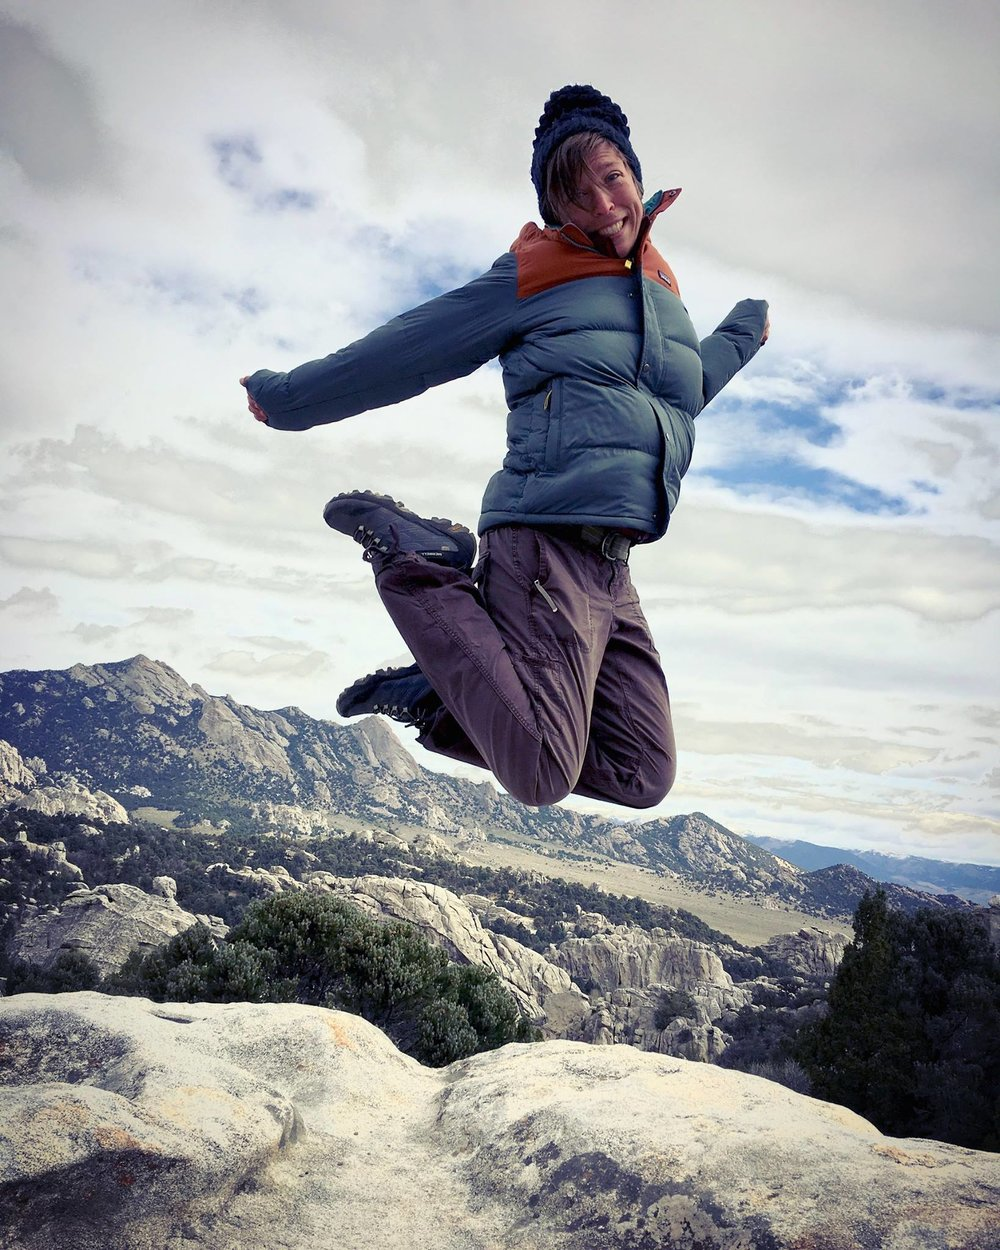 rock climb jump.jpg